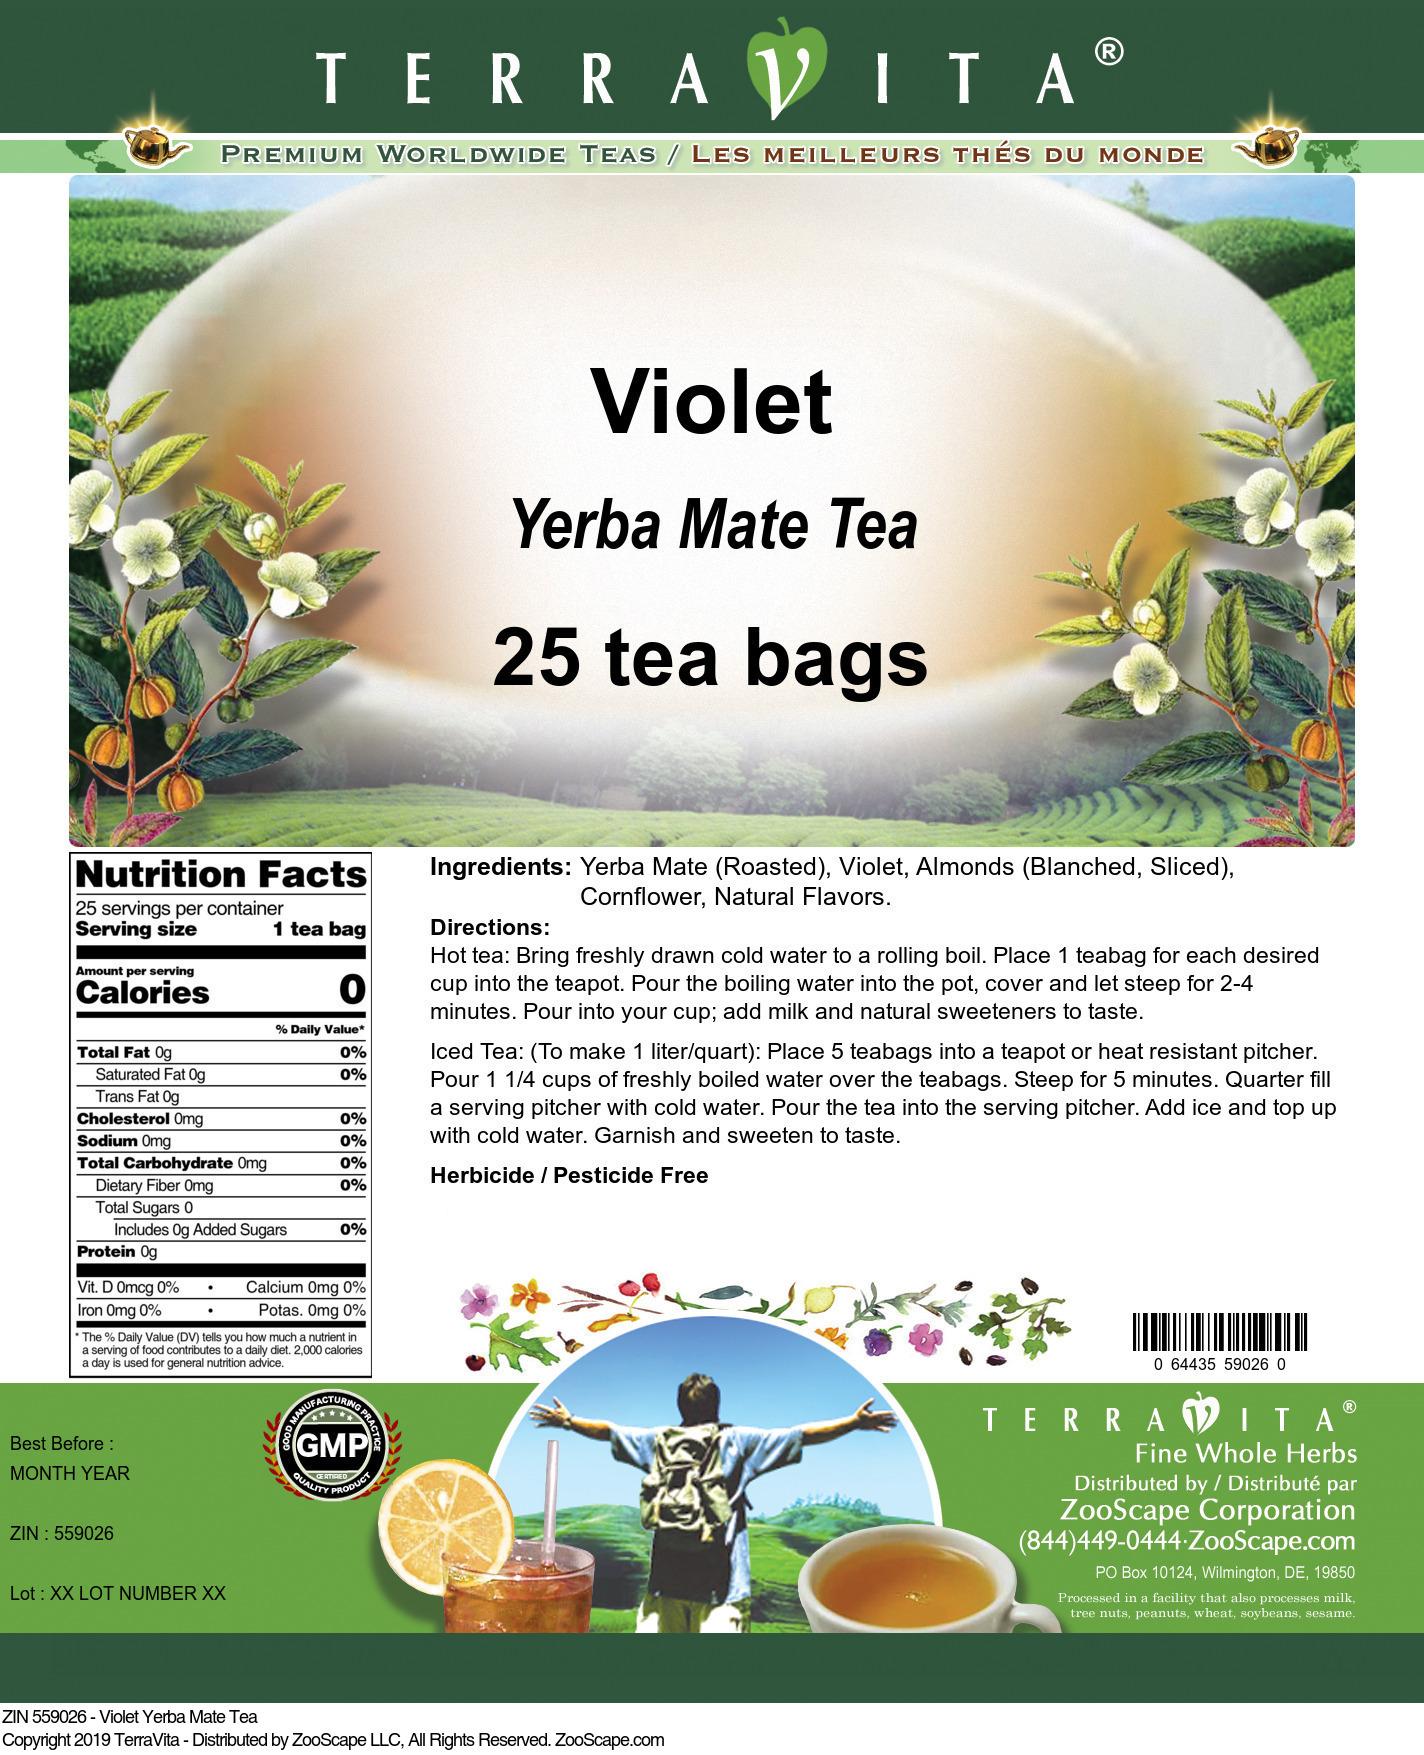 Violet Yerba Mate